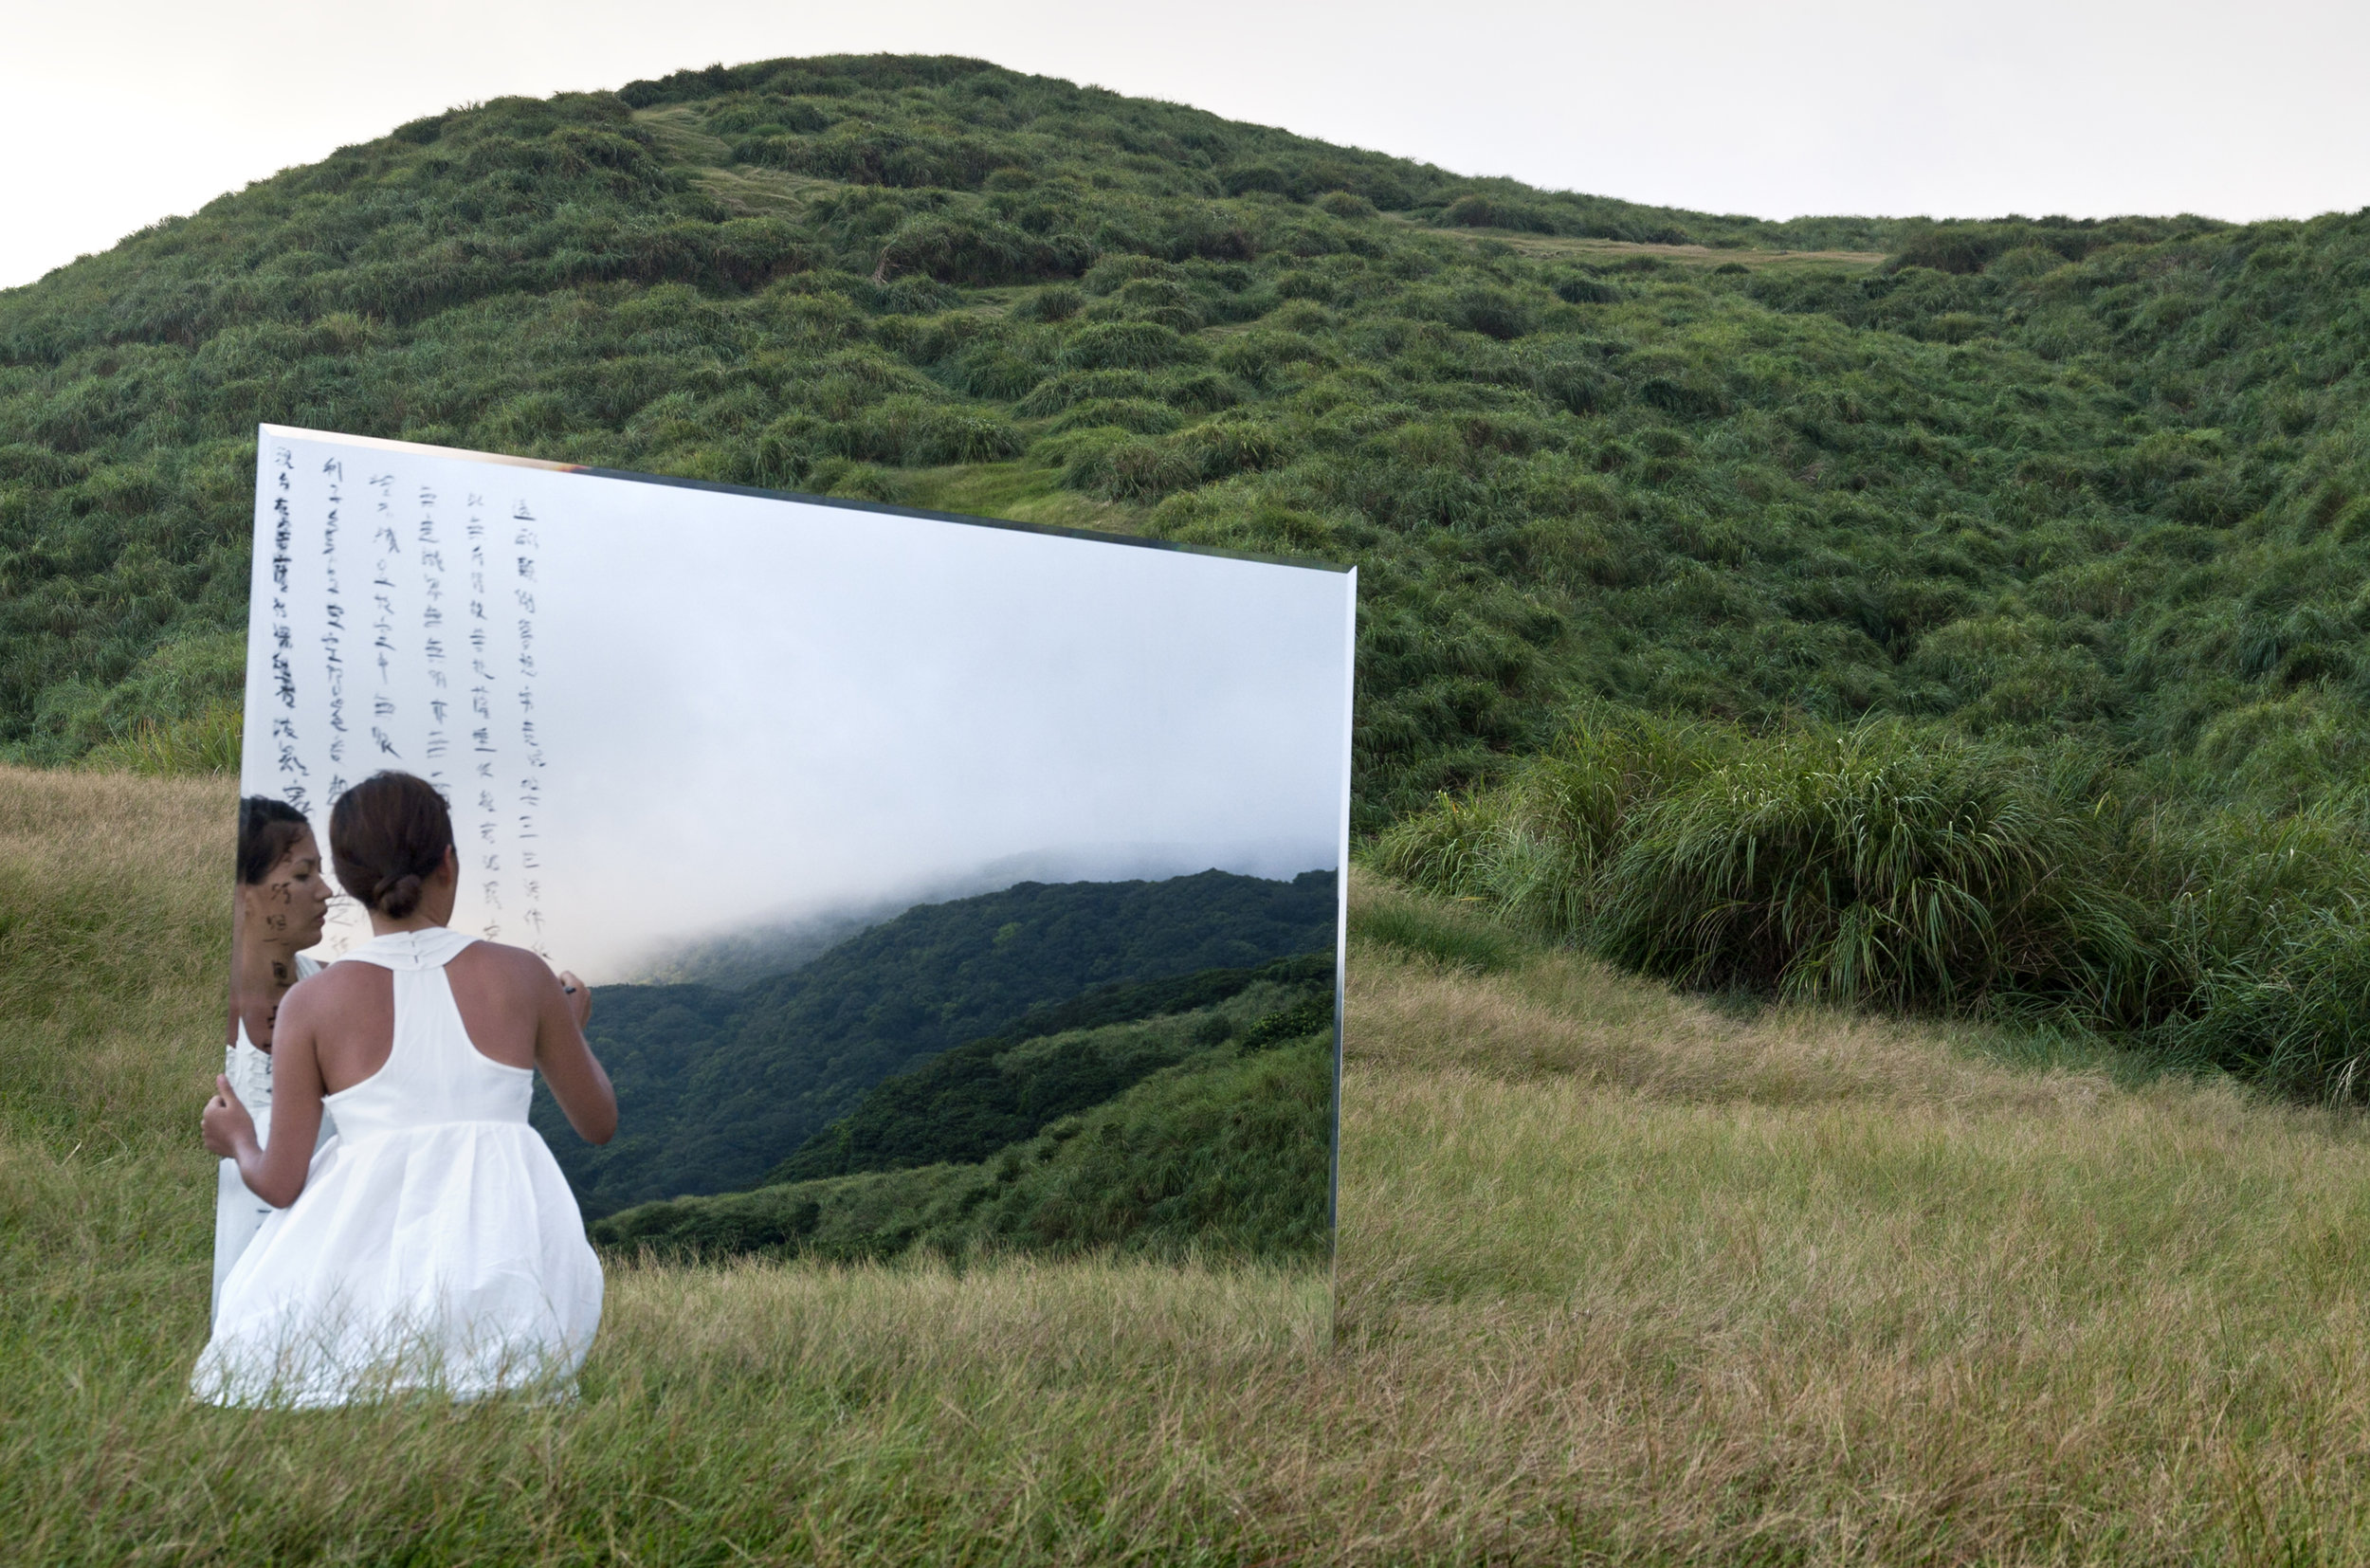 2009, Earth Mantra 02, Photograph, 67 x 120 cm